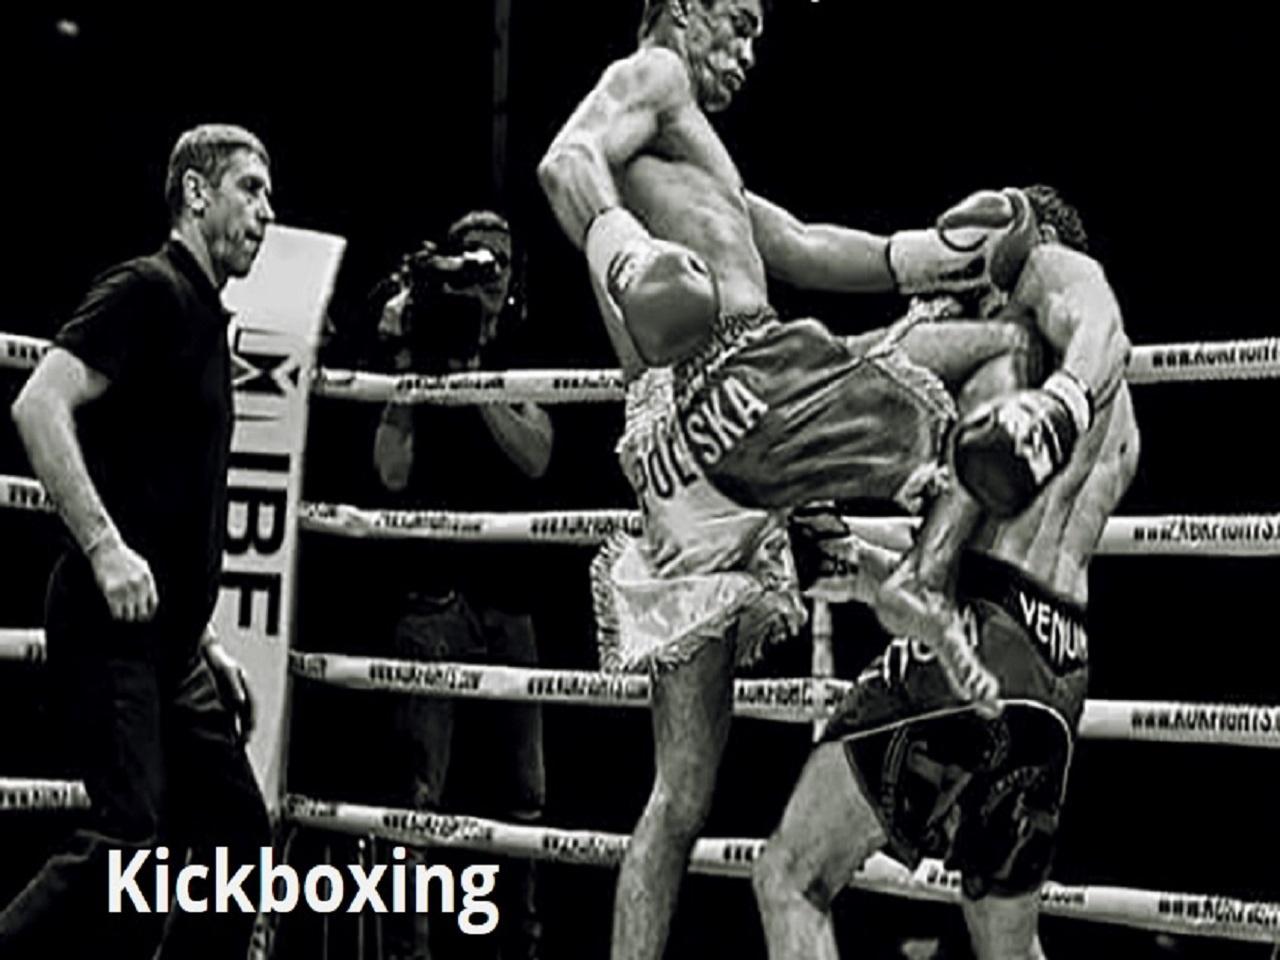 Legia Kickboxing